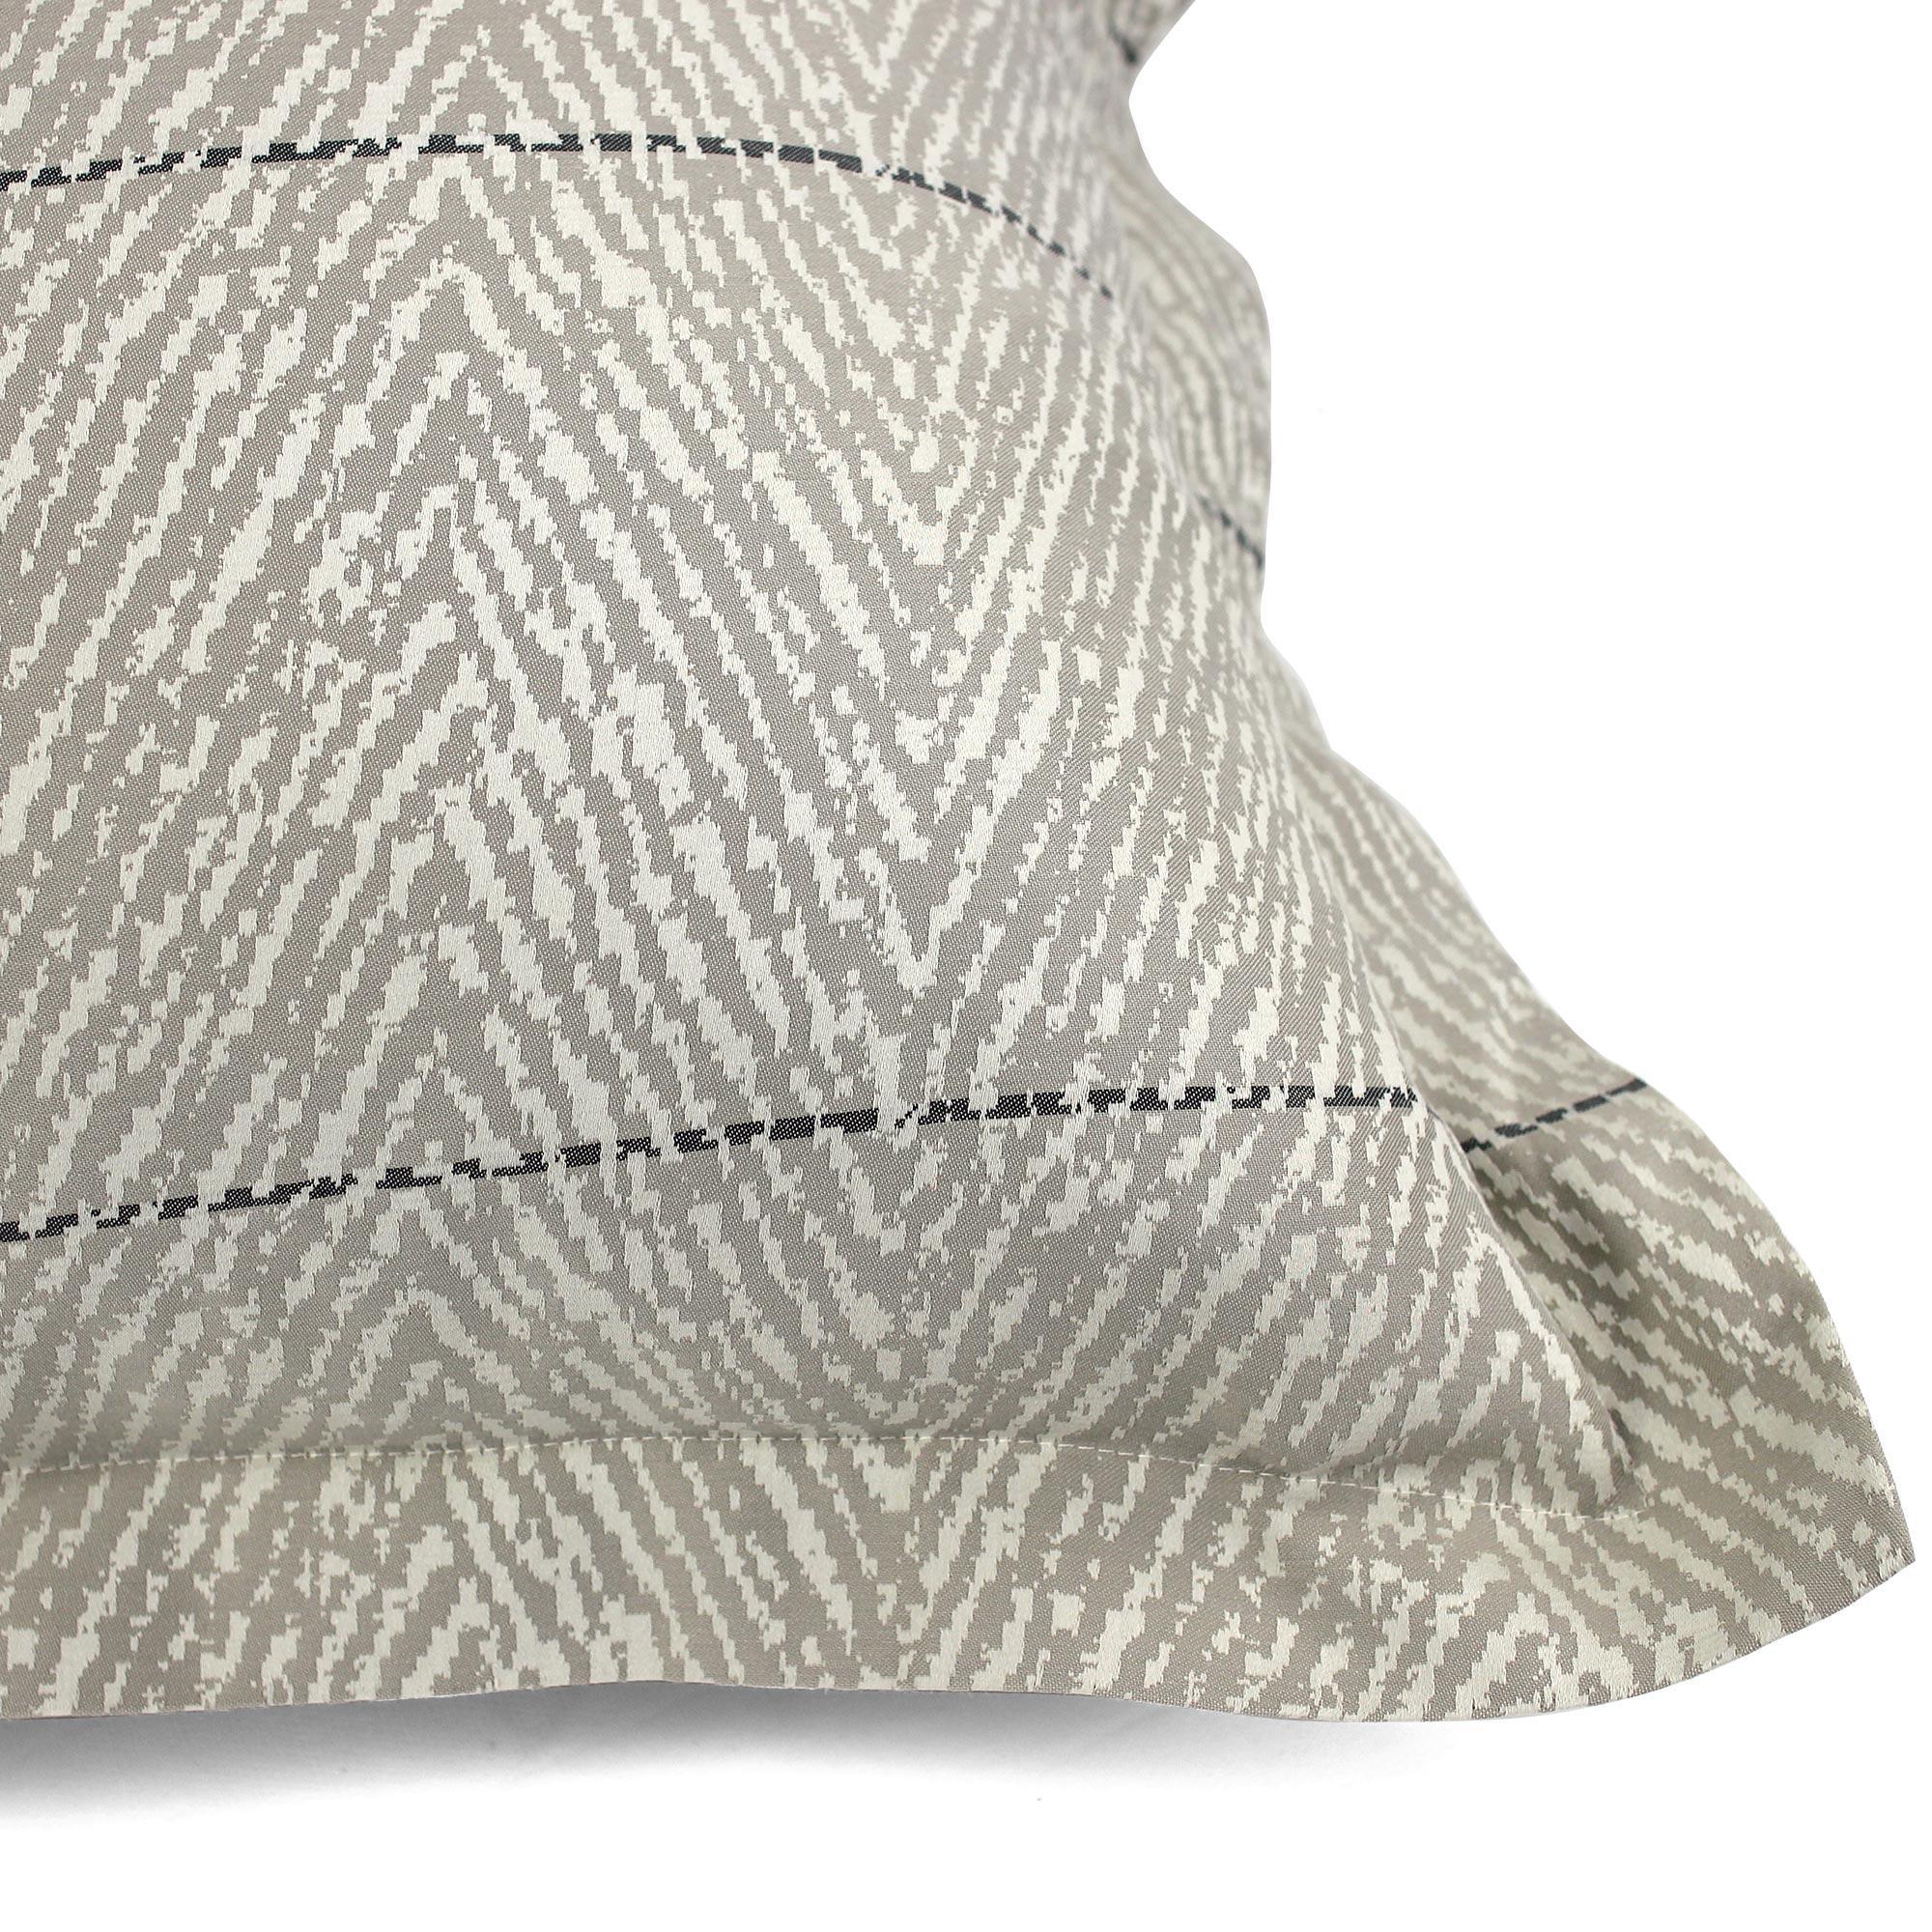 taie d 39 oreiller 65x65 satin de coton odeon marron clair ebay. Black Bedroom Furniture Sets. Home Design Ideas